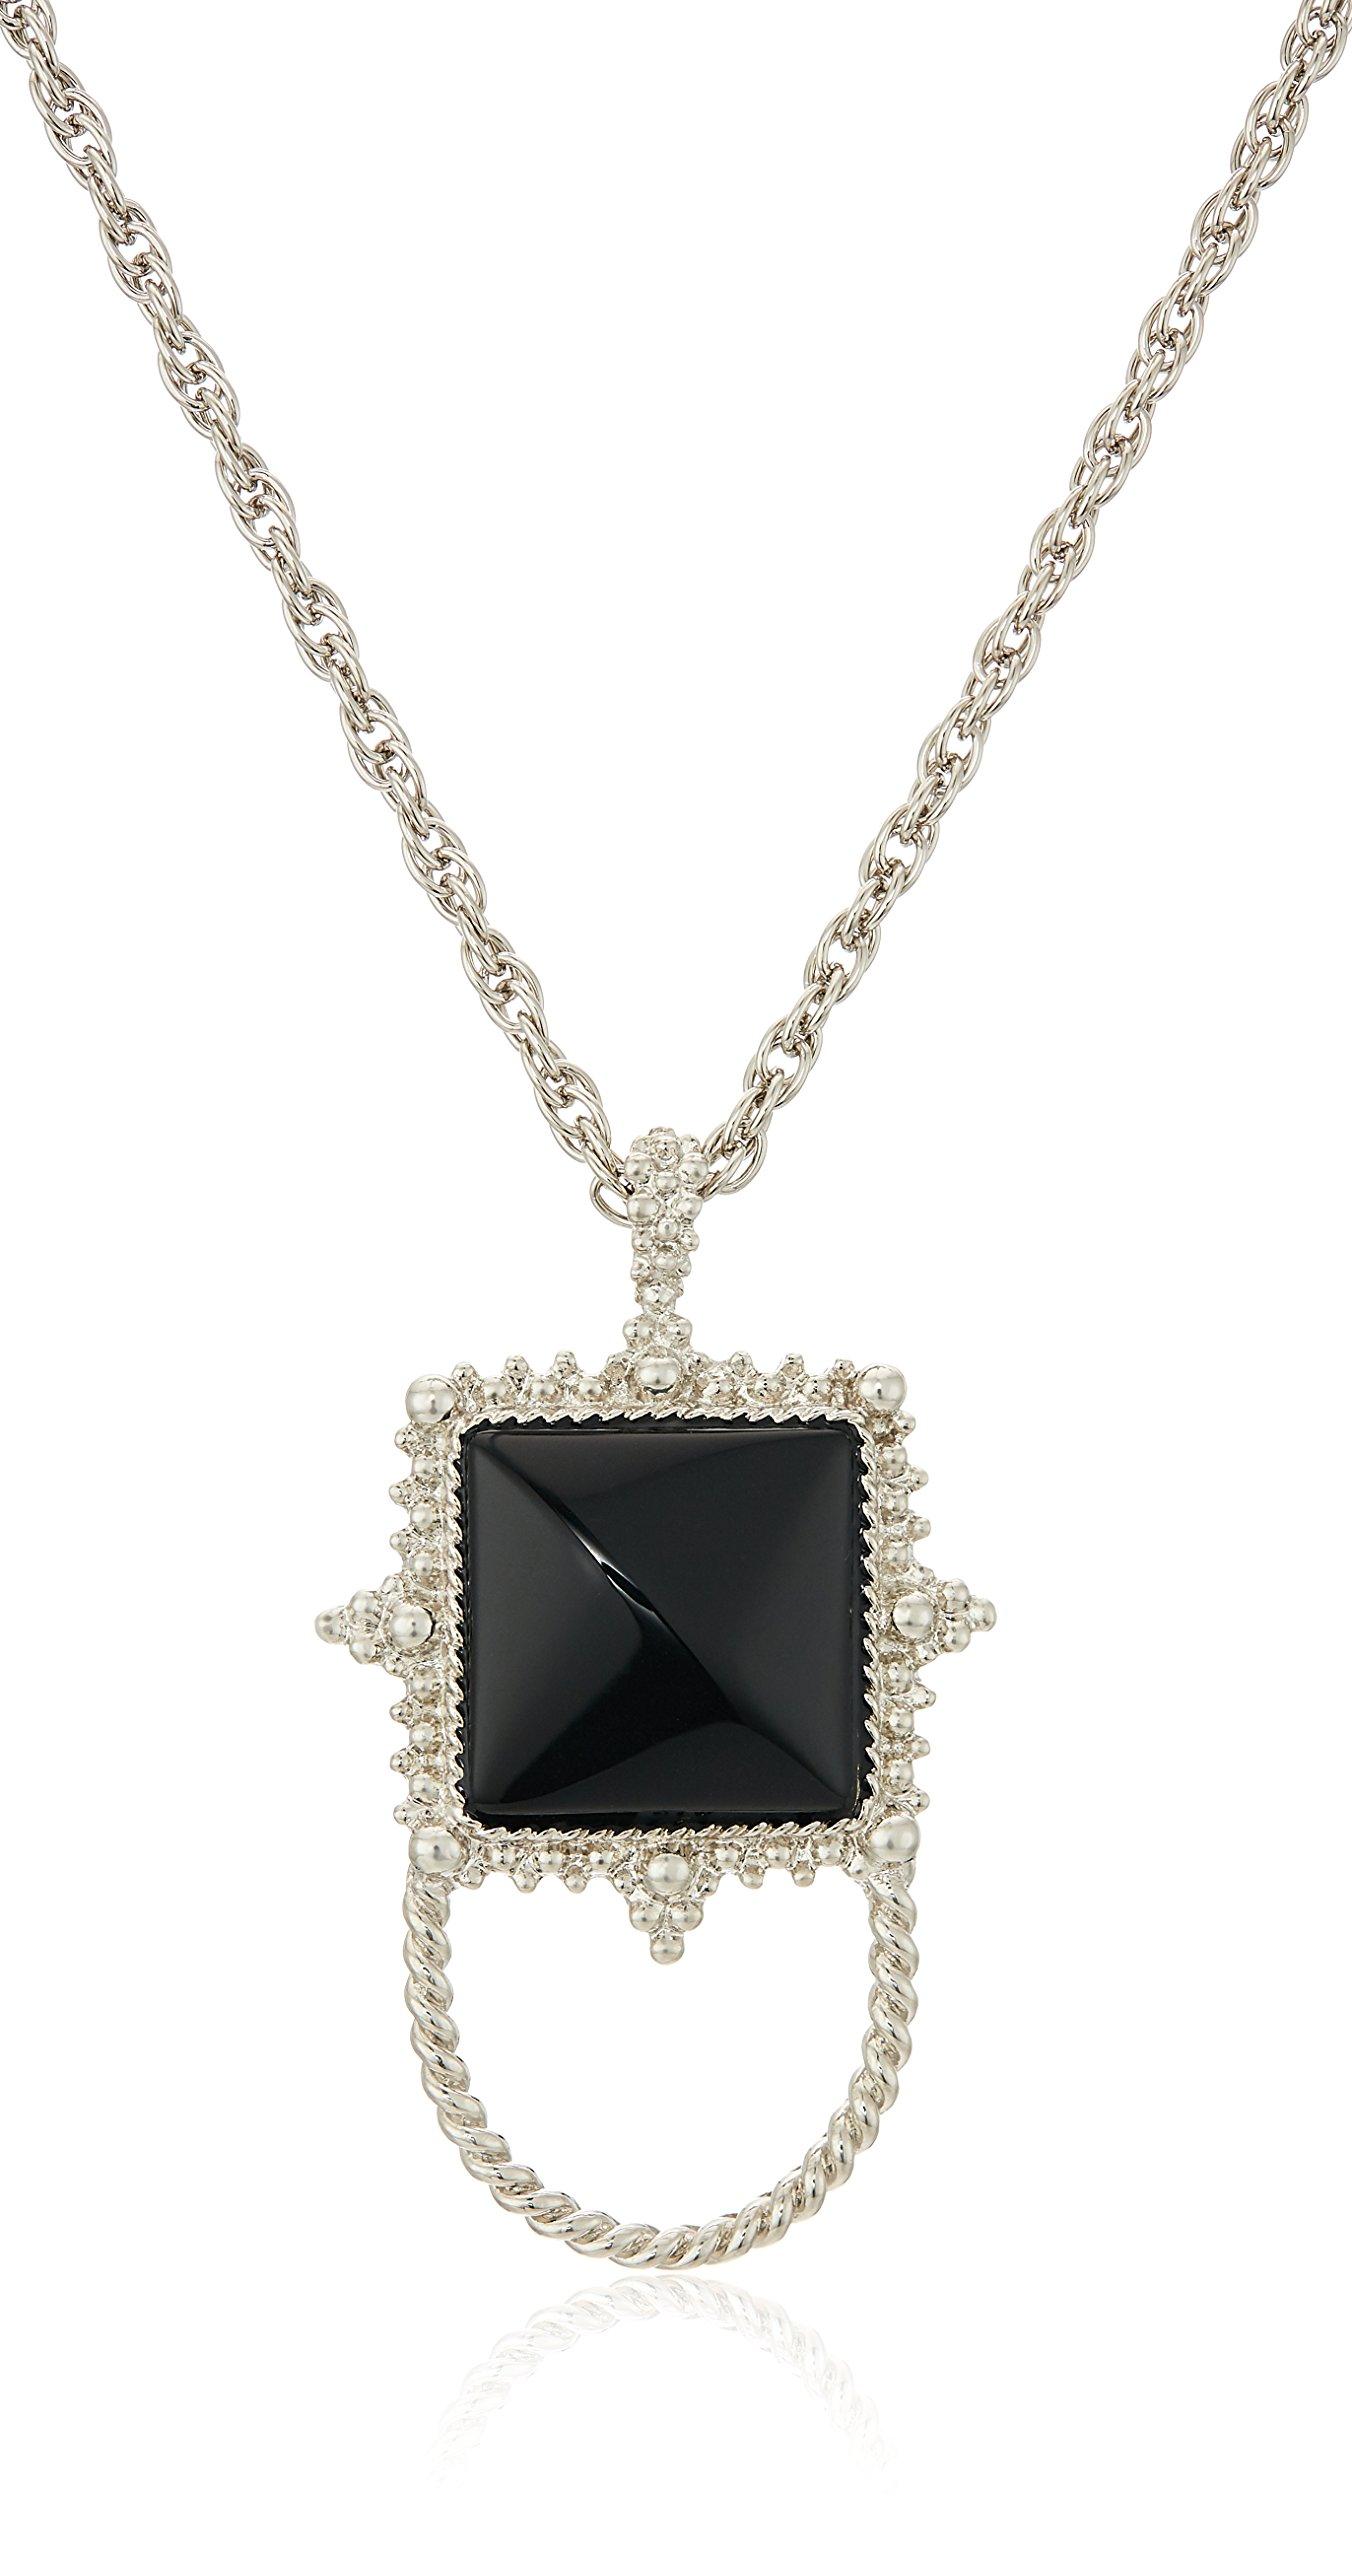 1928 Jewelry Womens Silver-Tone Semi-Precious Onyx Square Eyeglass/Badge Holder Pendant Enhancer, Black, 30 by 1928 Jewelry